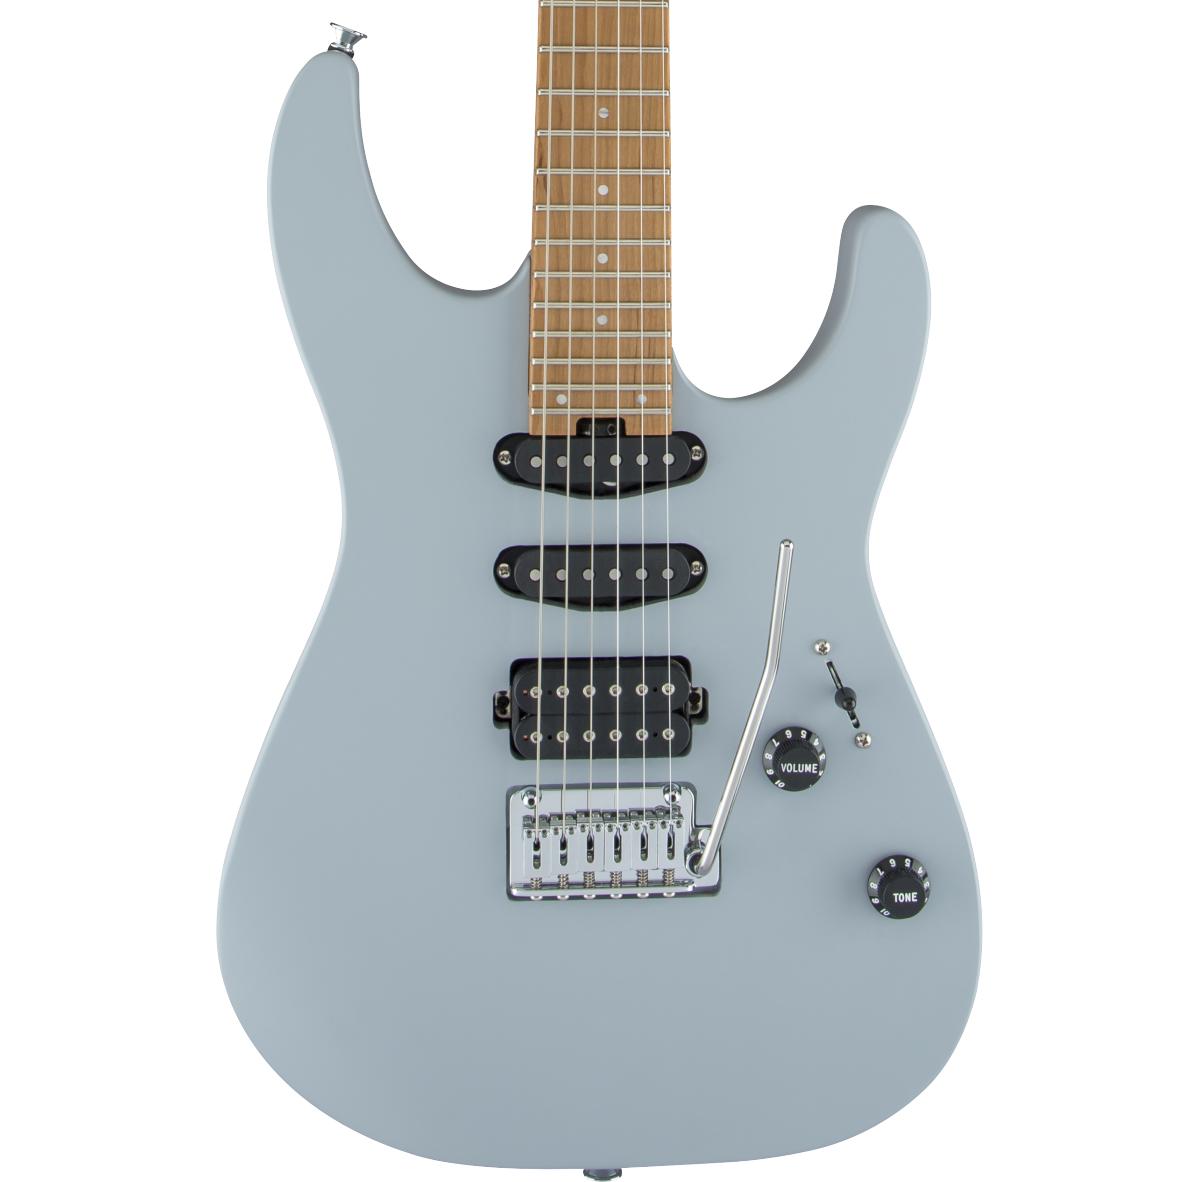 Charvel Pro-Mod DK24 HSS 2PT CM - Caramelized Maple Fingerboard, Primer Gray